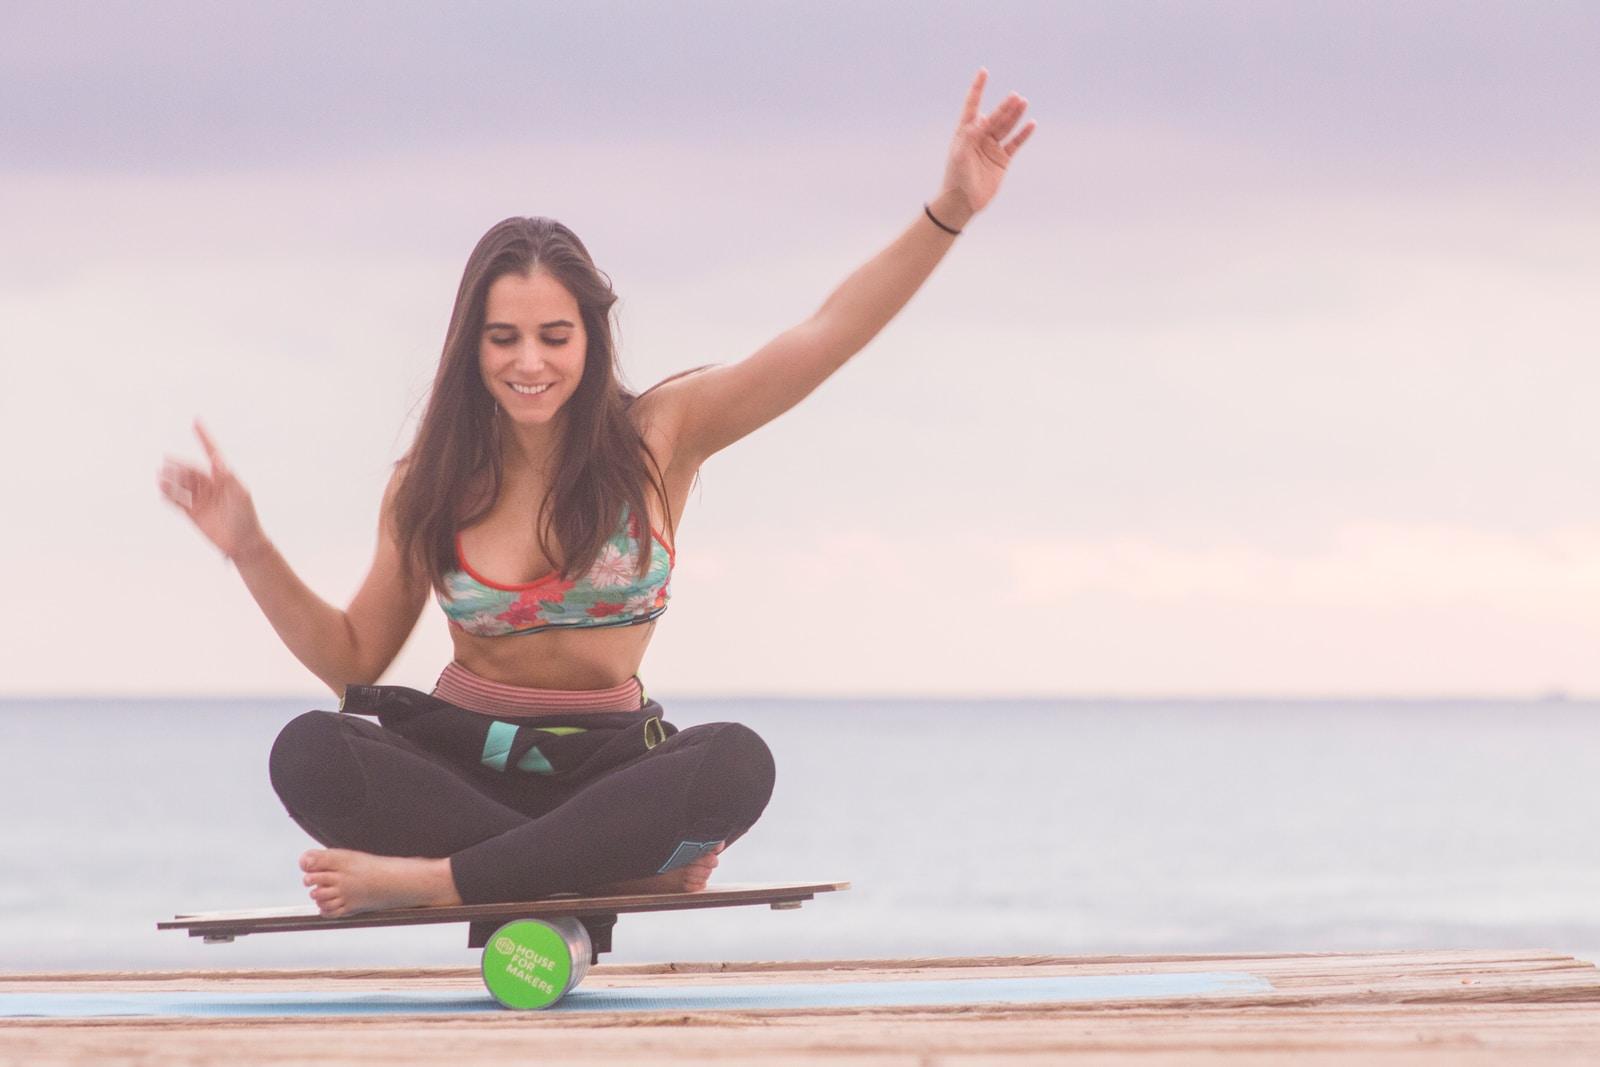 woman balancing on board